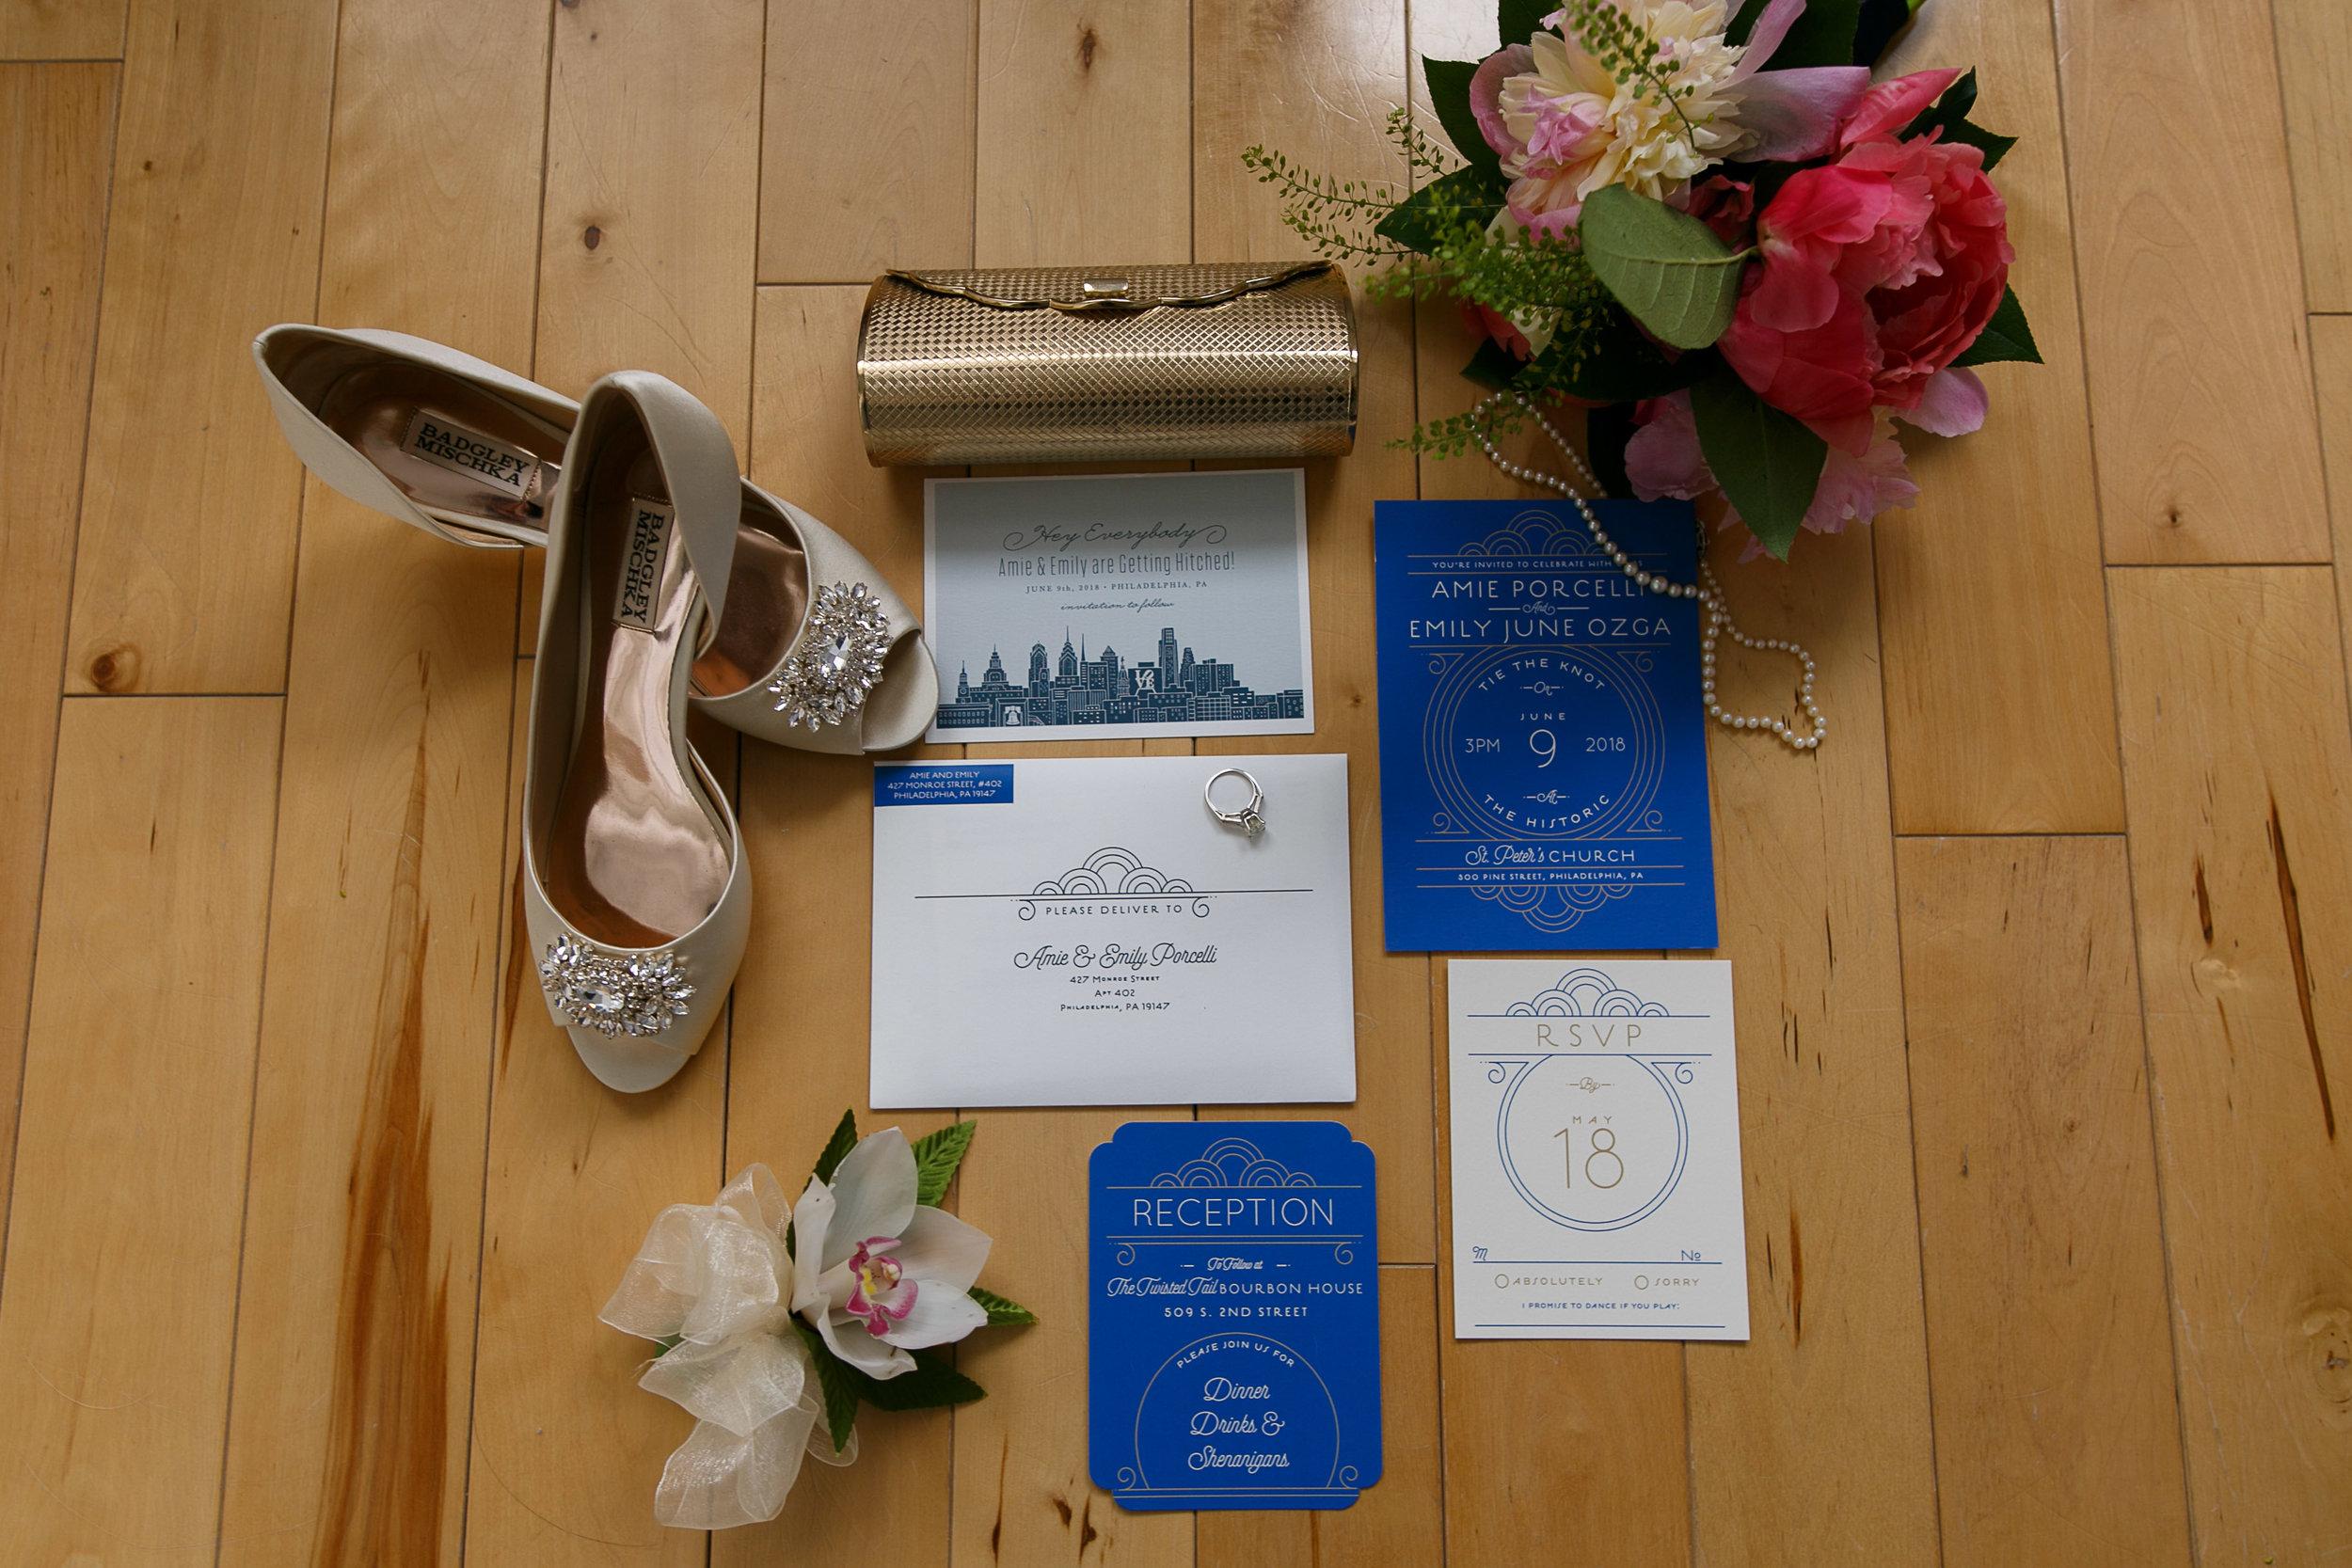 A&E Headhouse Square Philly LGBTQ Wedding-10.jpg